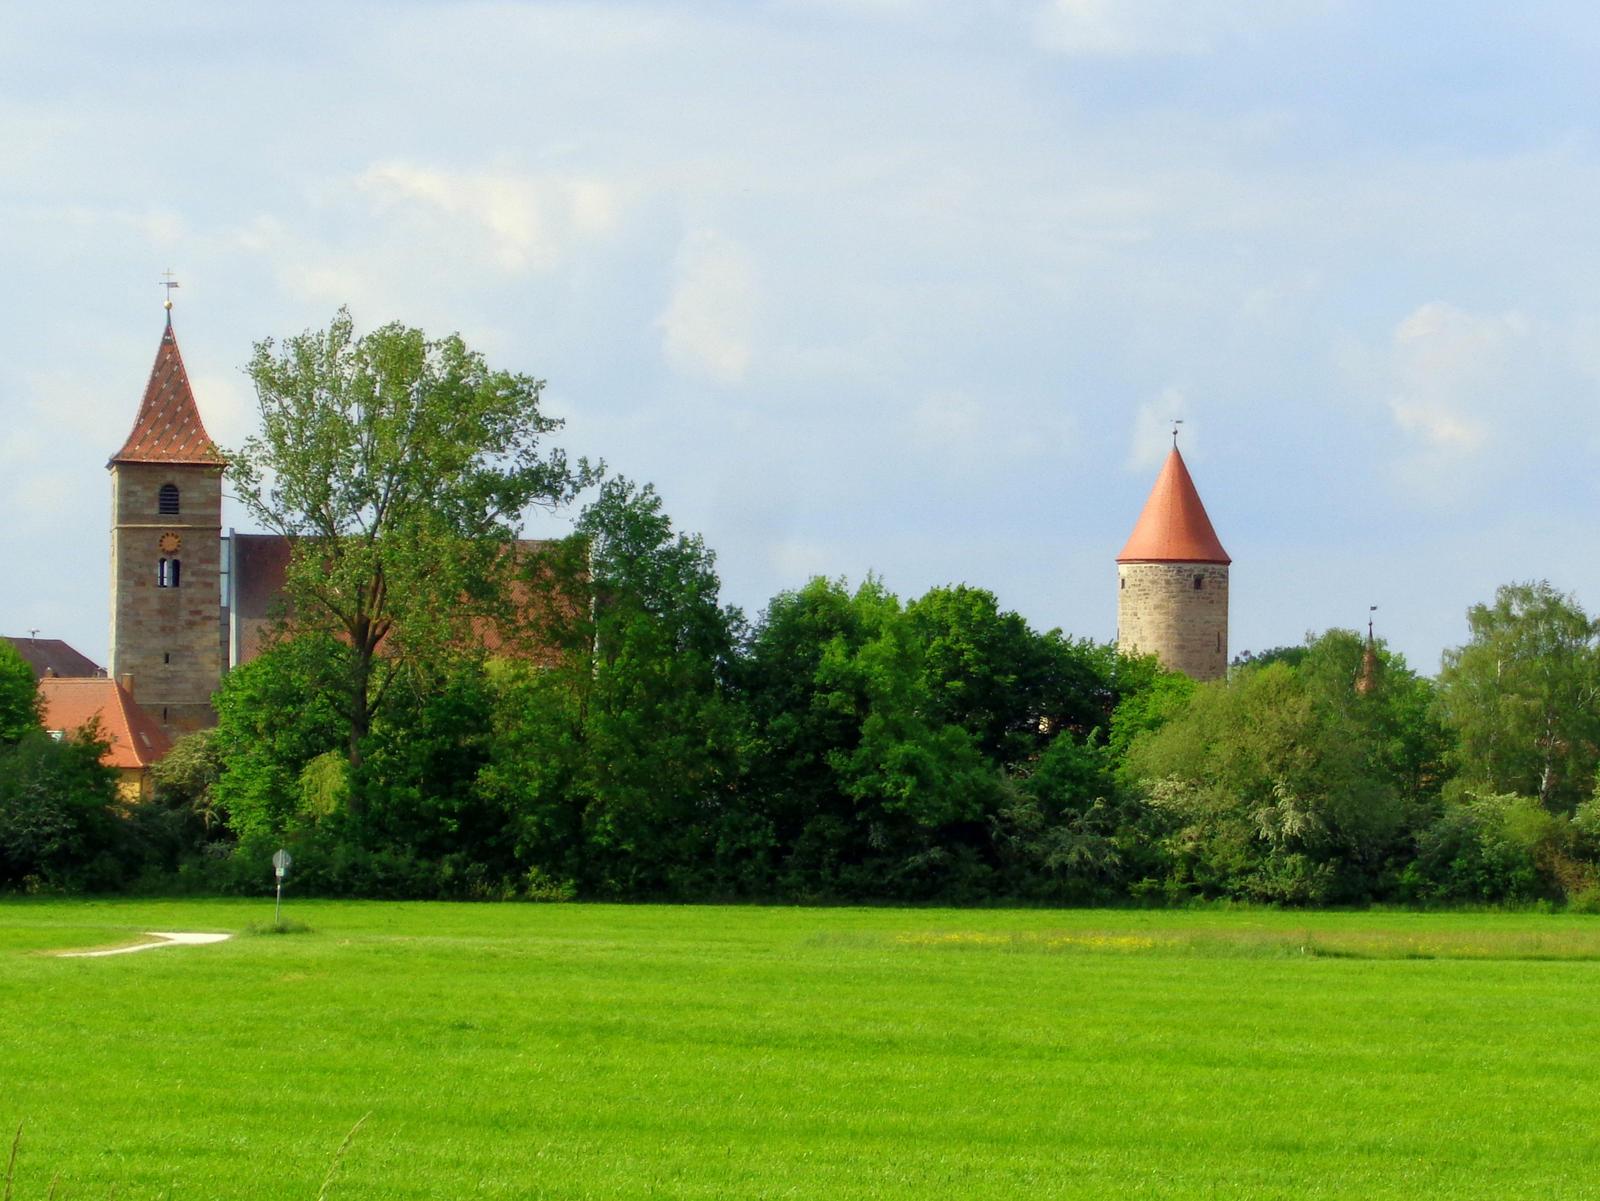 village Ornbau by Mittelfranke